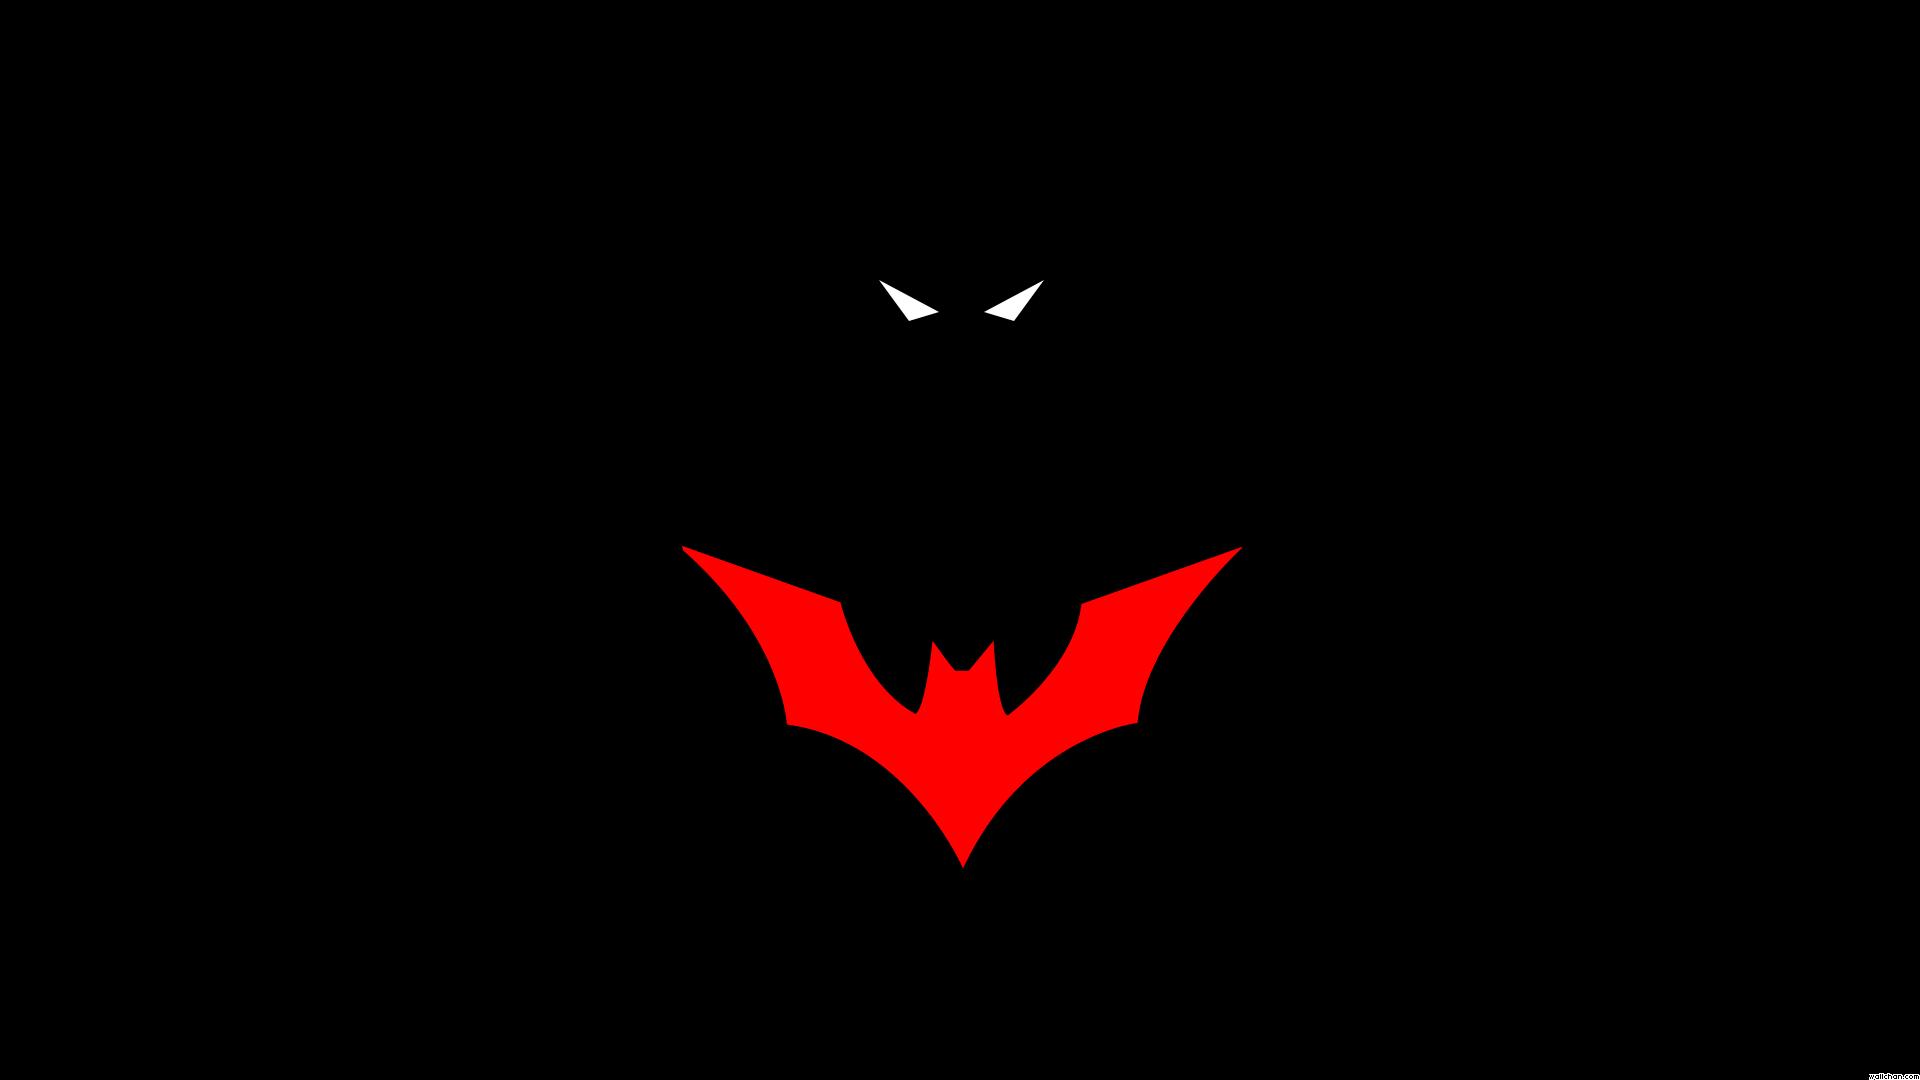 Batman Desktop Wallpaper Batman Wallpaper Batman Cartoon Batman Beyond